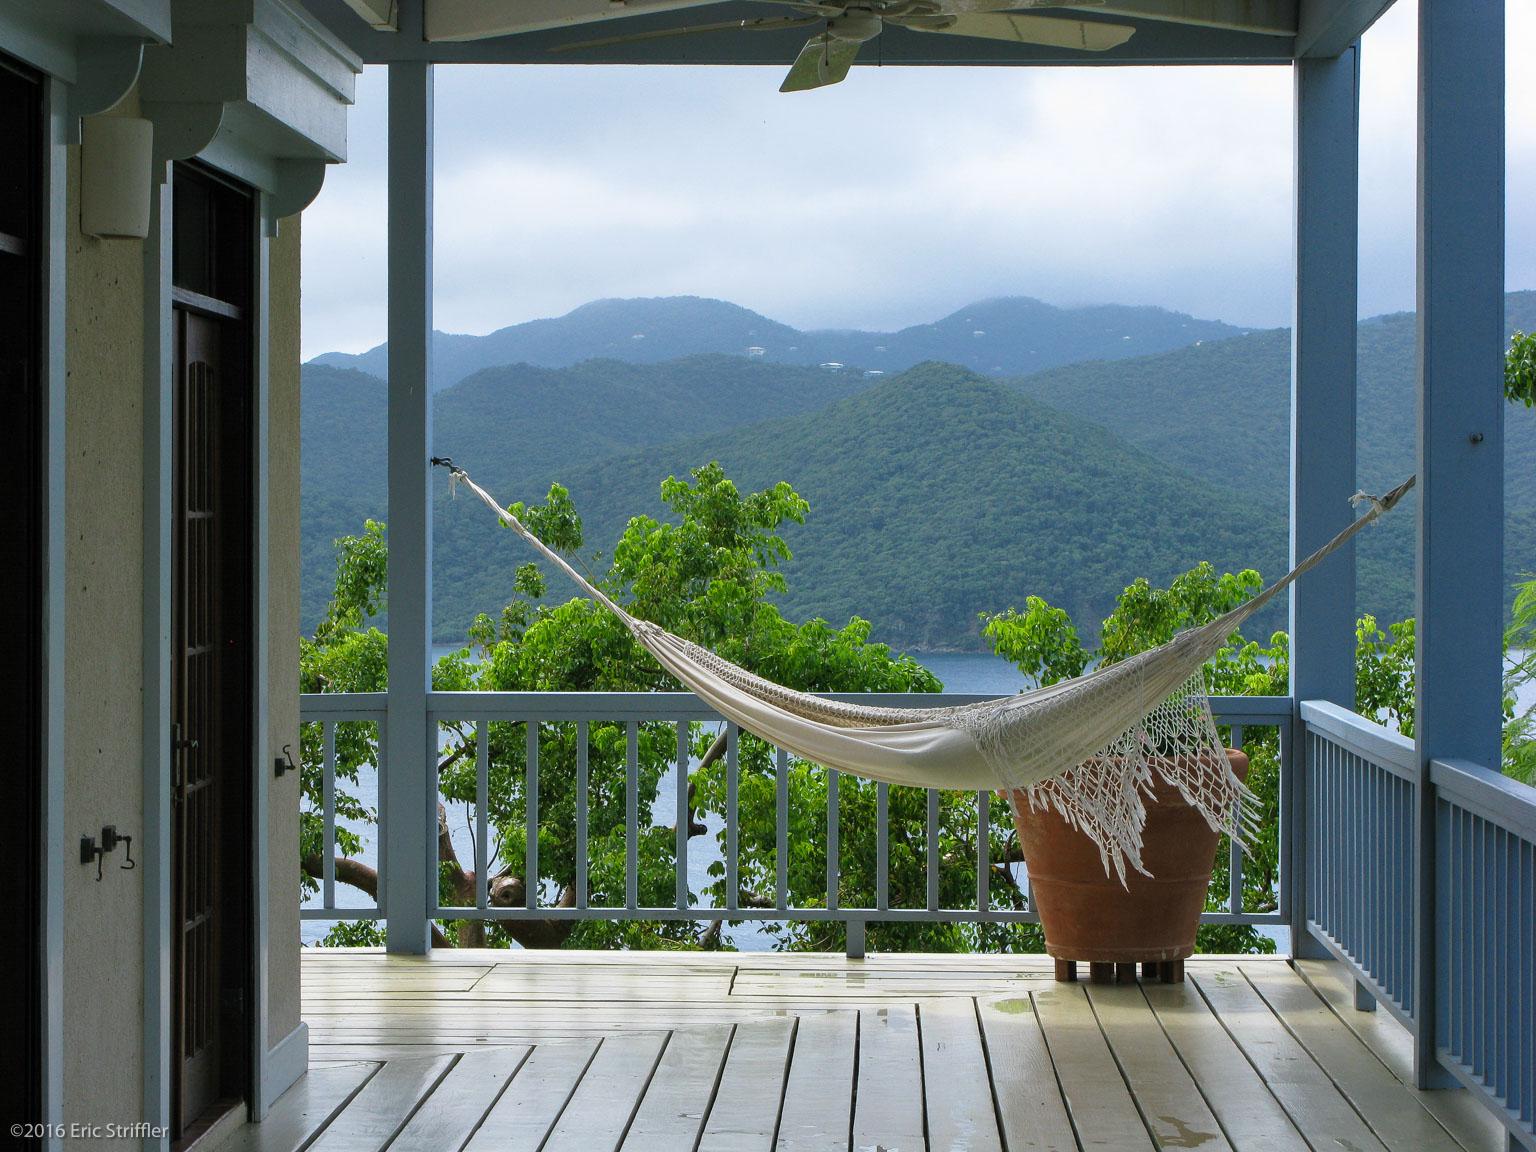 Private villa, Tortola, BVI (Caribbean)